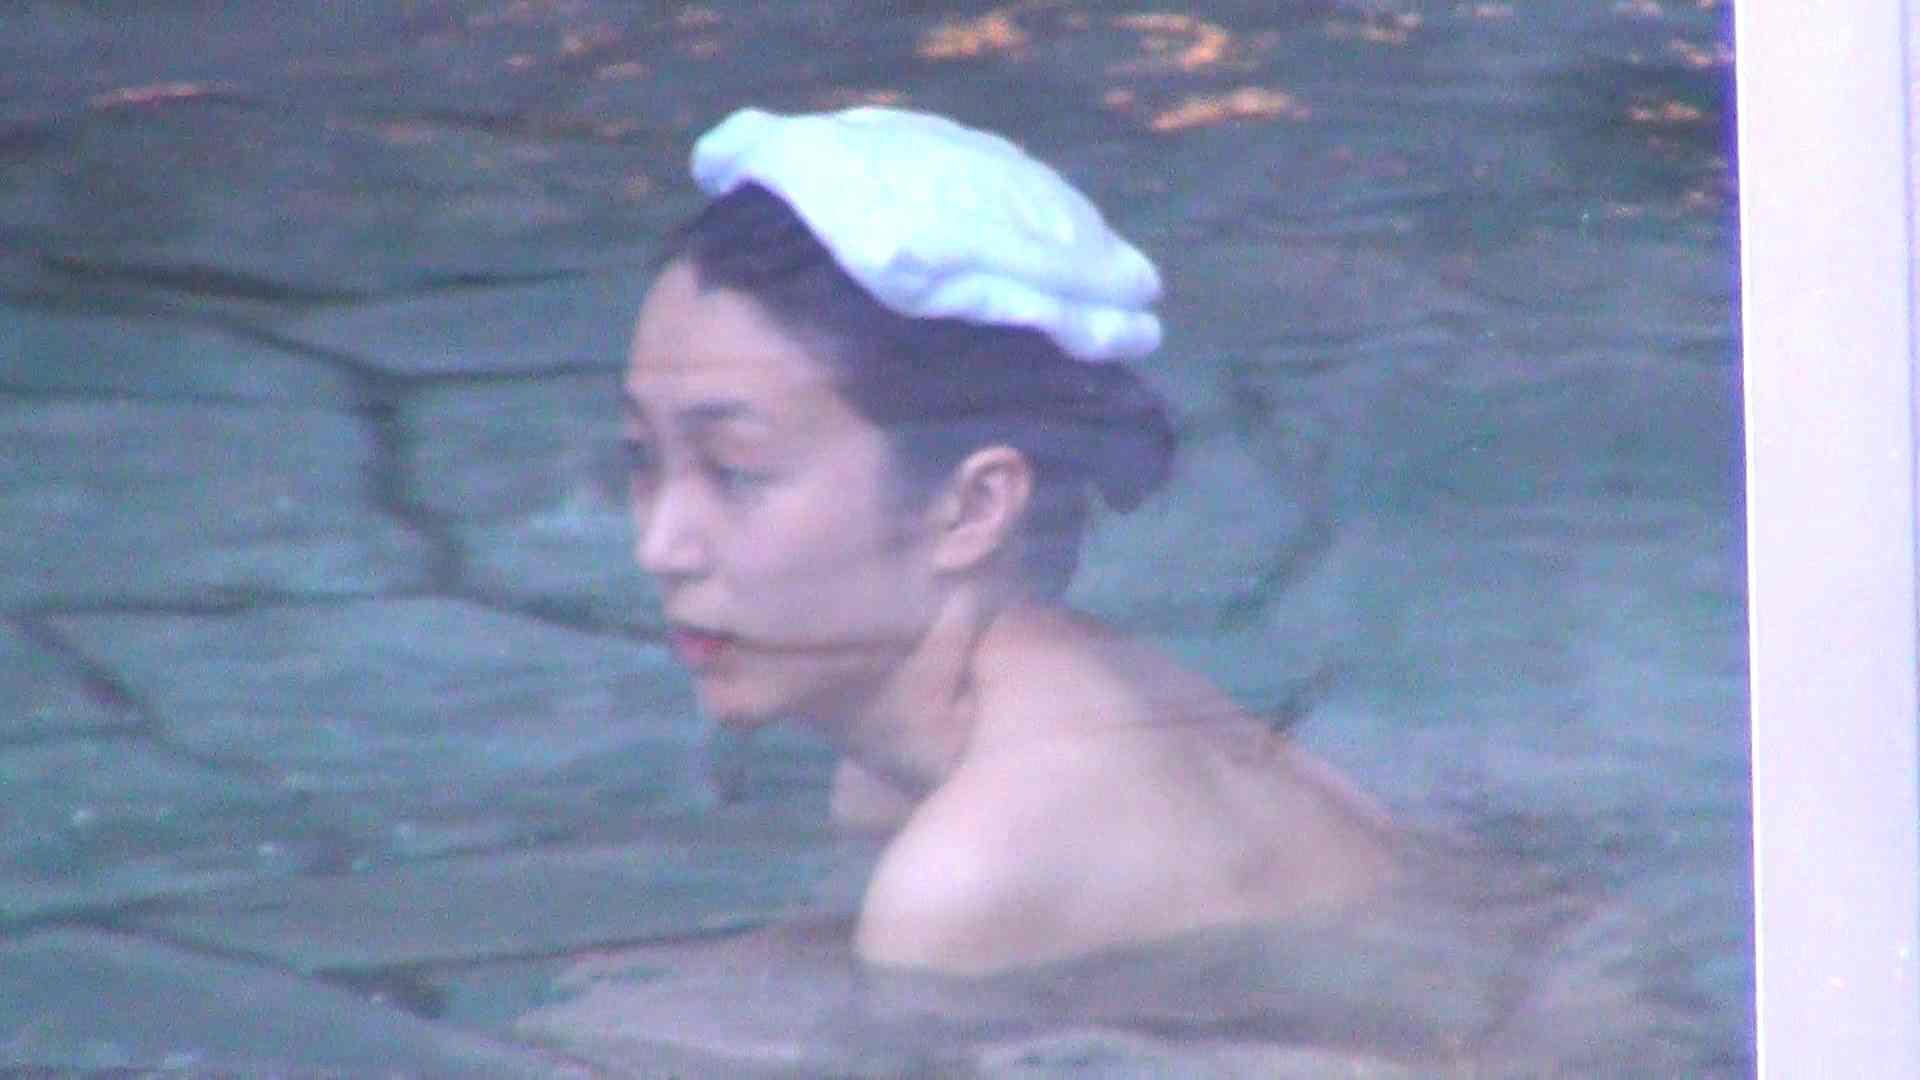 Aquaな露天風呂Vol.290 OL  109連発 30